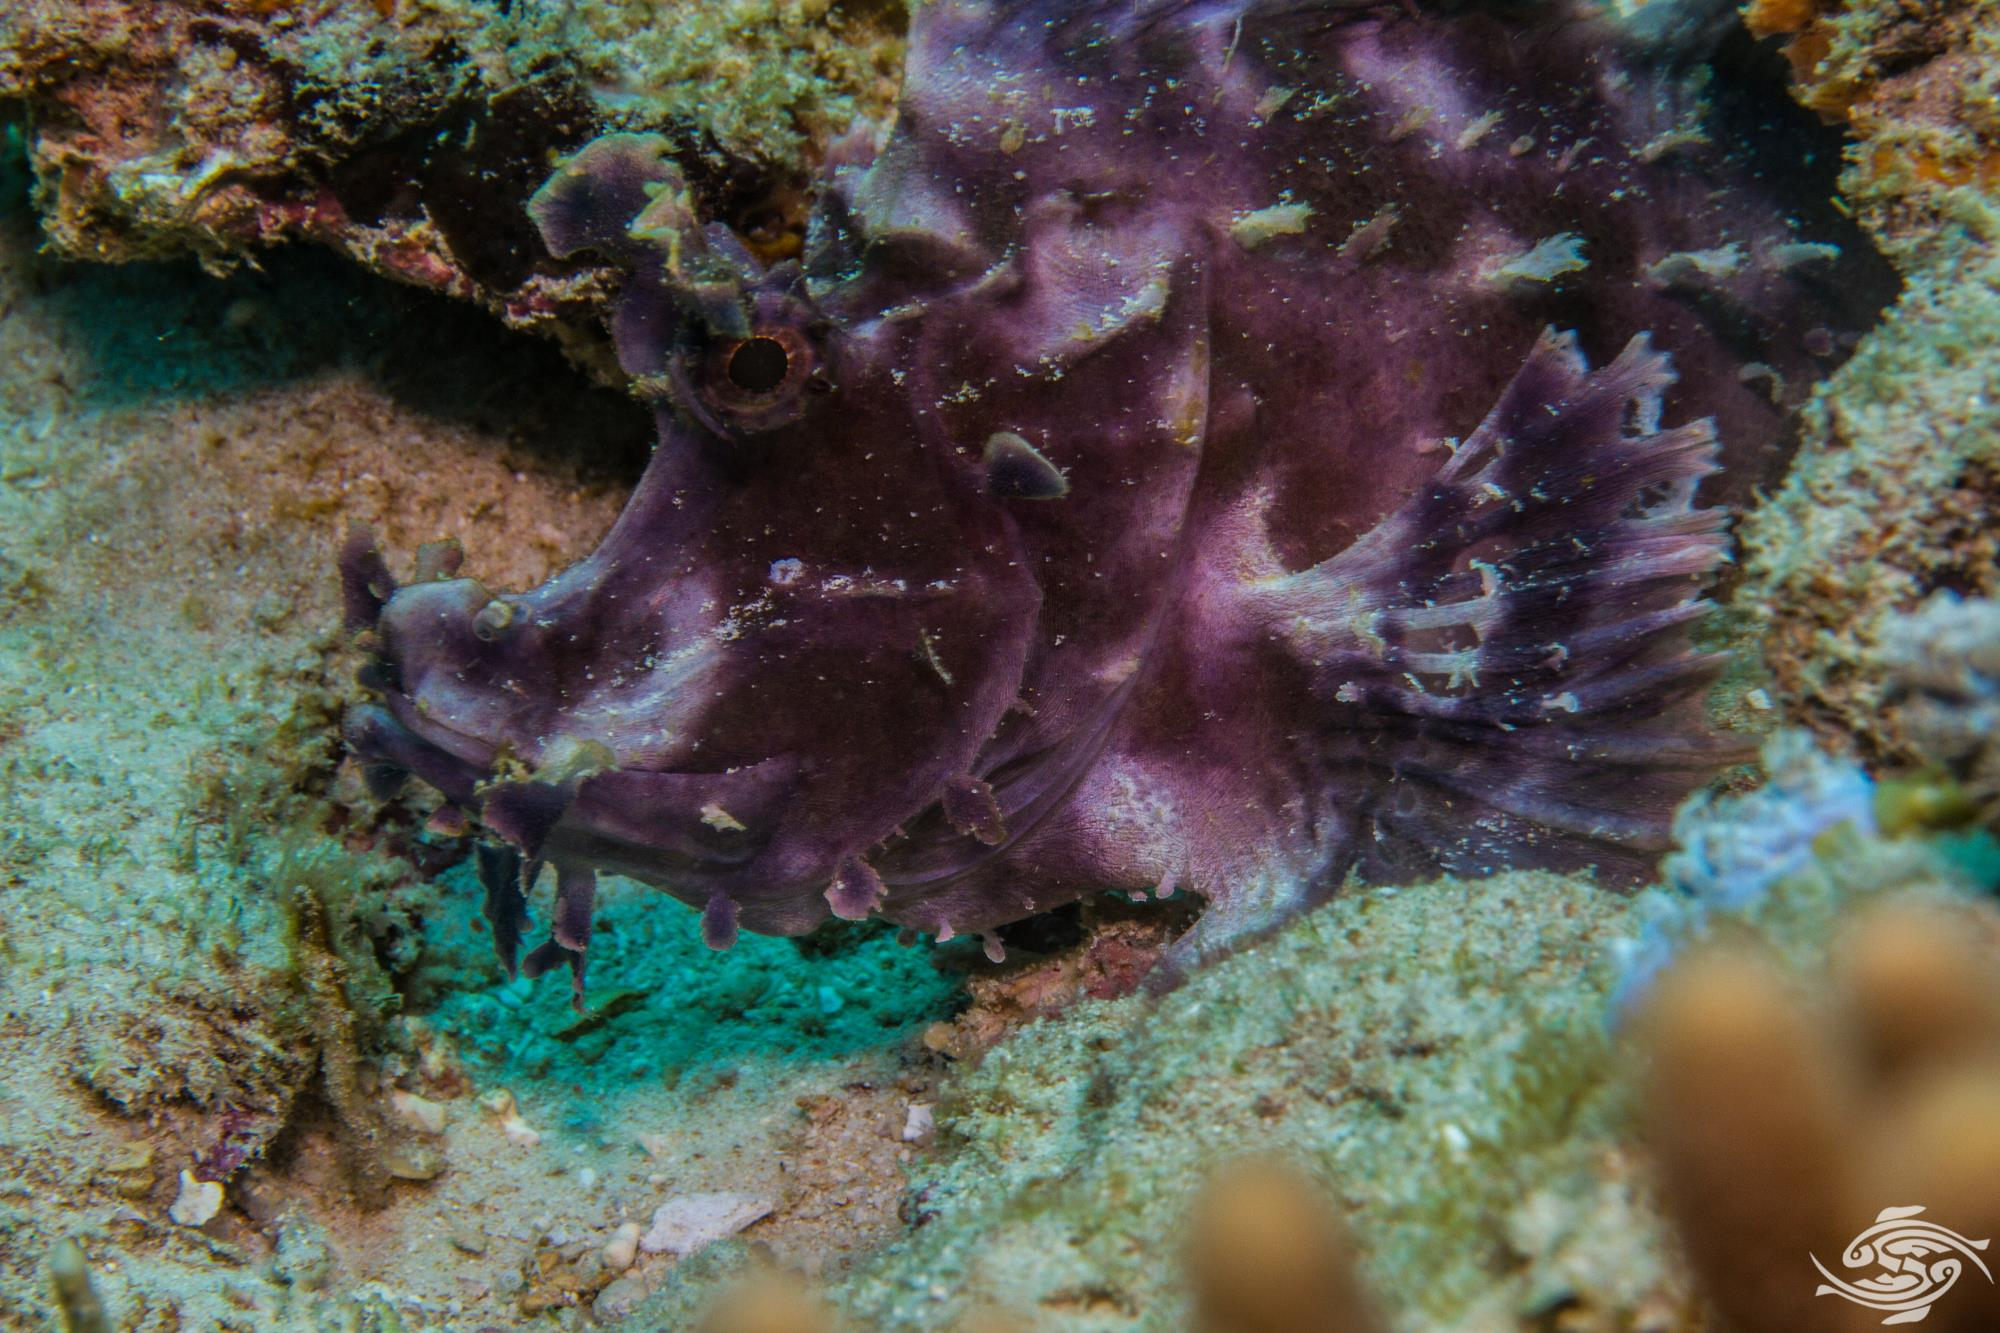 Paddle-flap scorpionfish or Eschmeyer's scorpionfish Rhinopias eschmeyeri